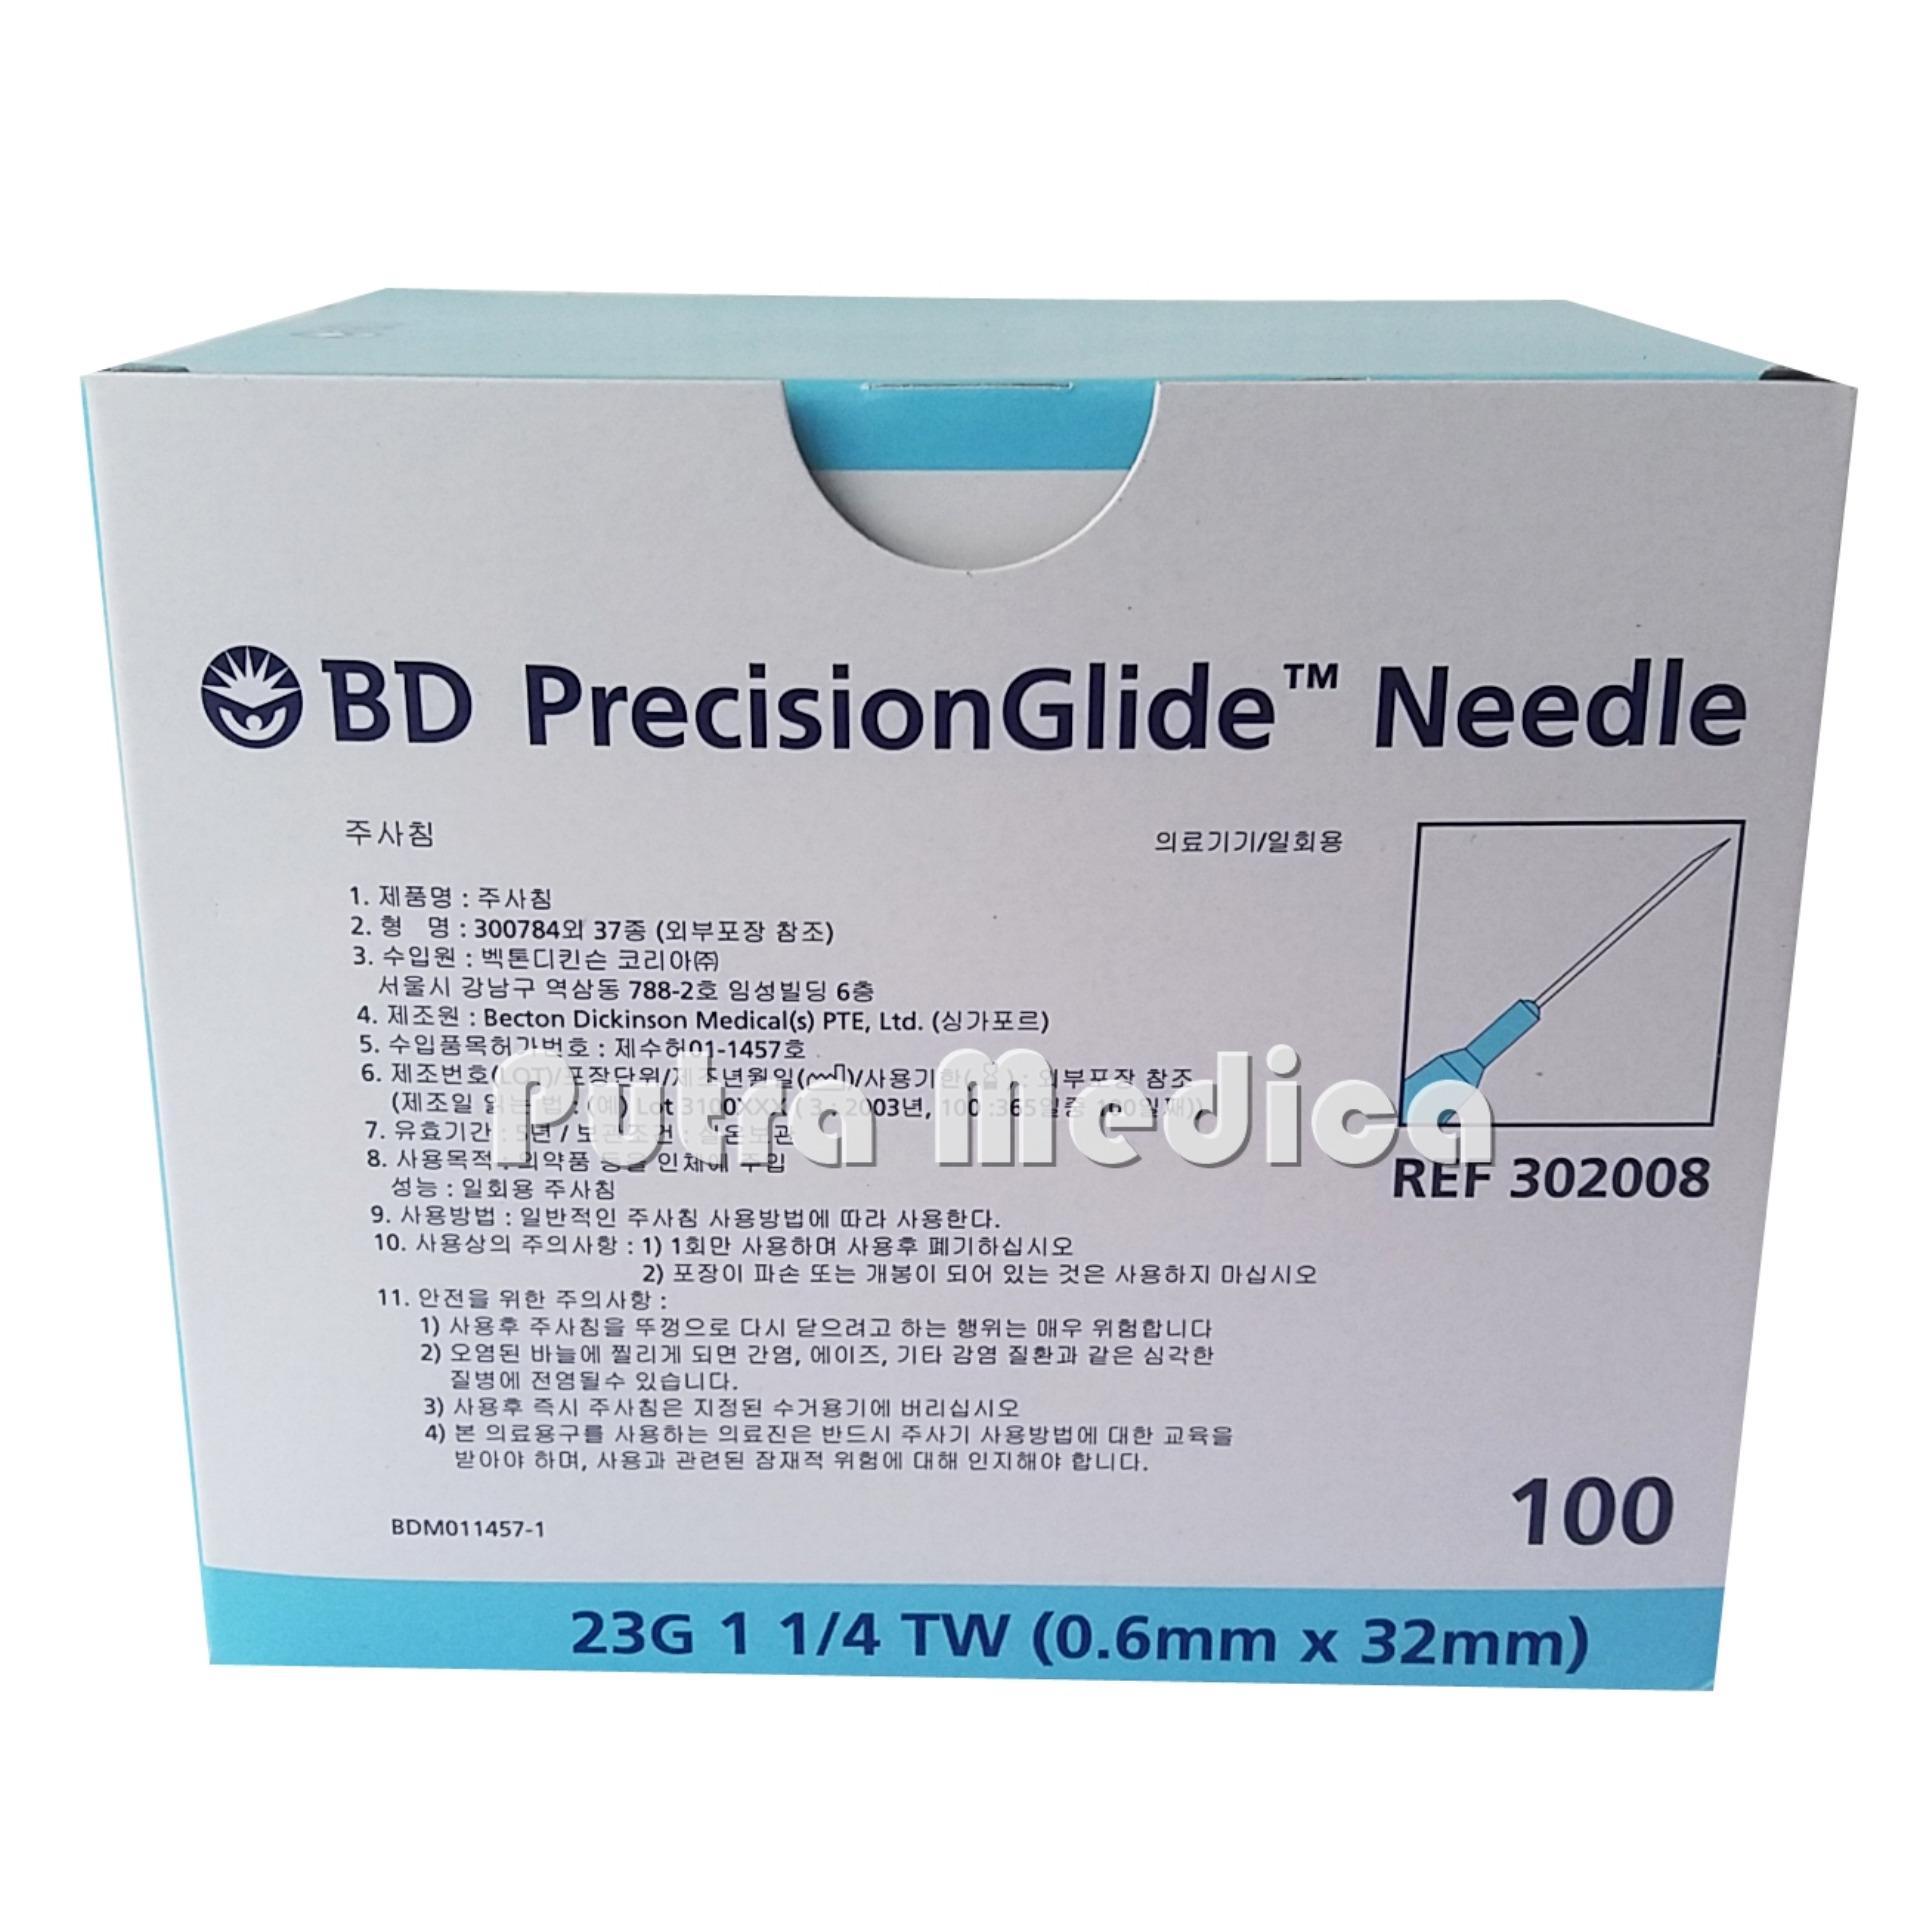 Gidcare Disposable Syringe Spuit Alat Suntik Injection 3ml Daftar Bd Flash Sale Needle Jarum 23g